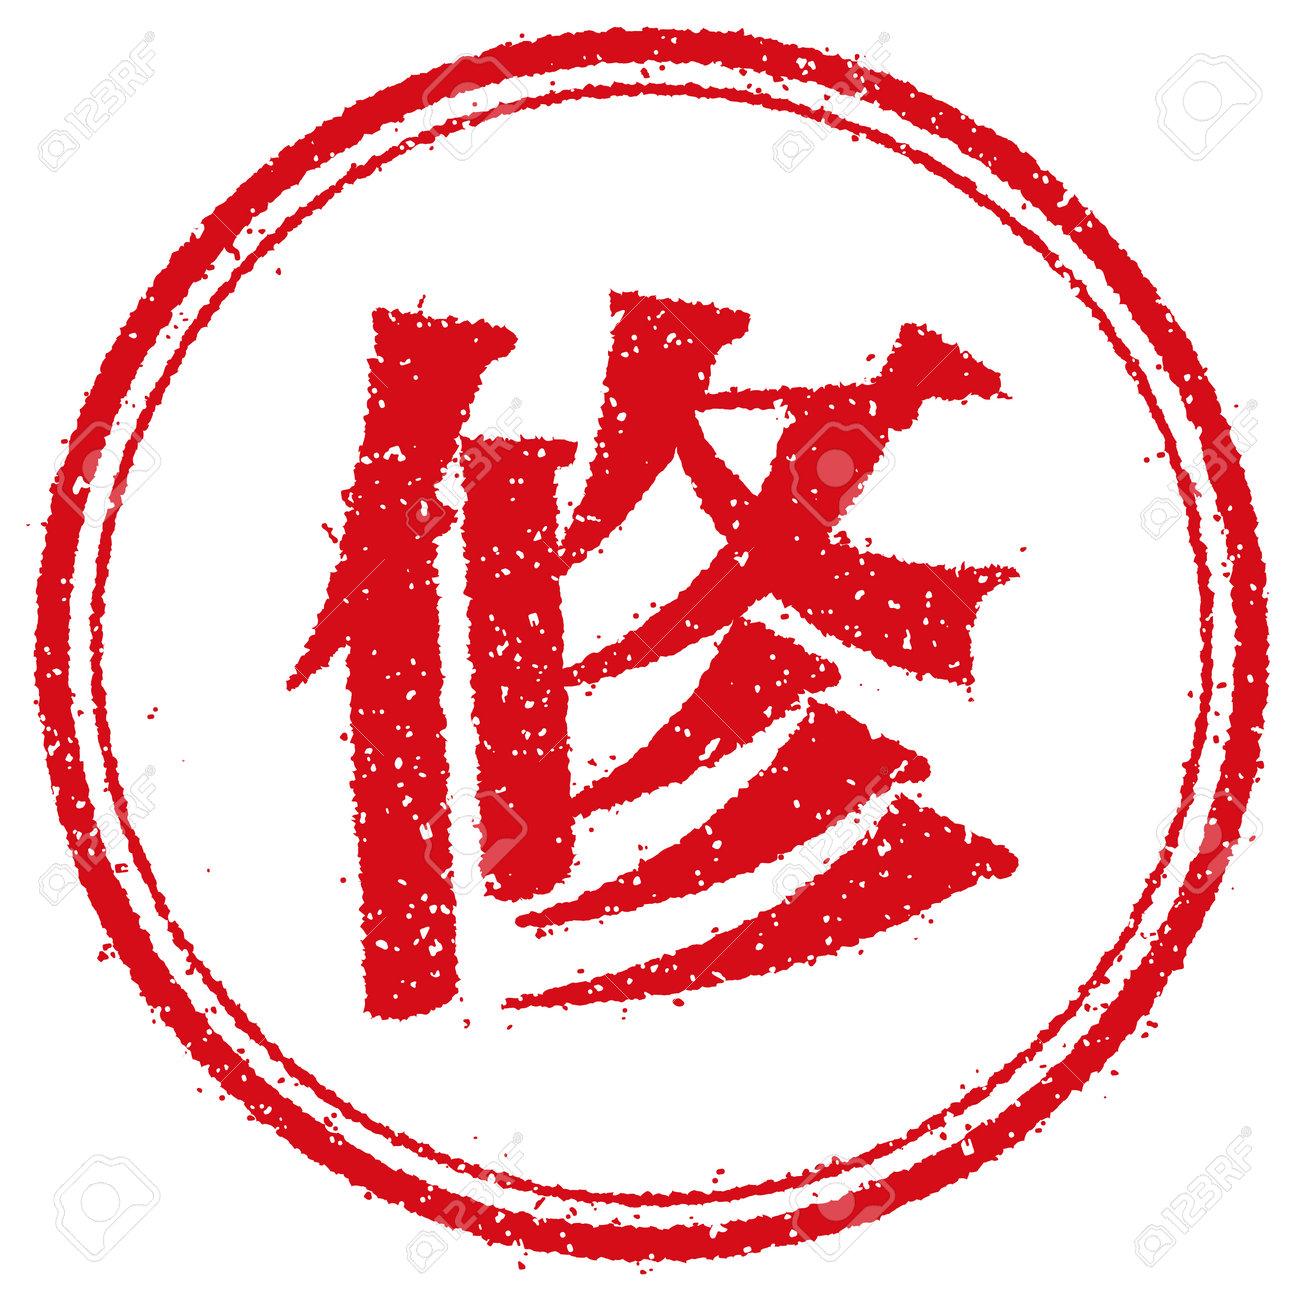 Rubber stamp illustration for Japanese business | fix, redo - 168732362